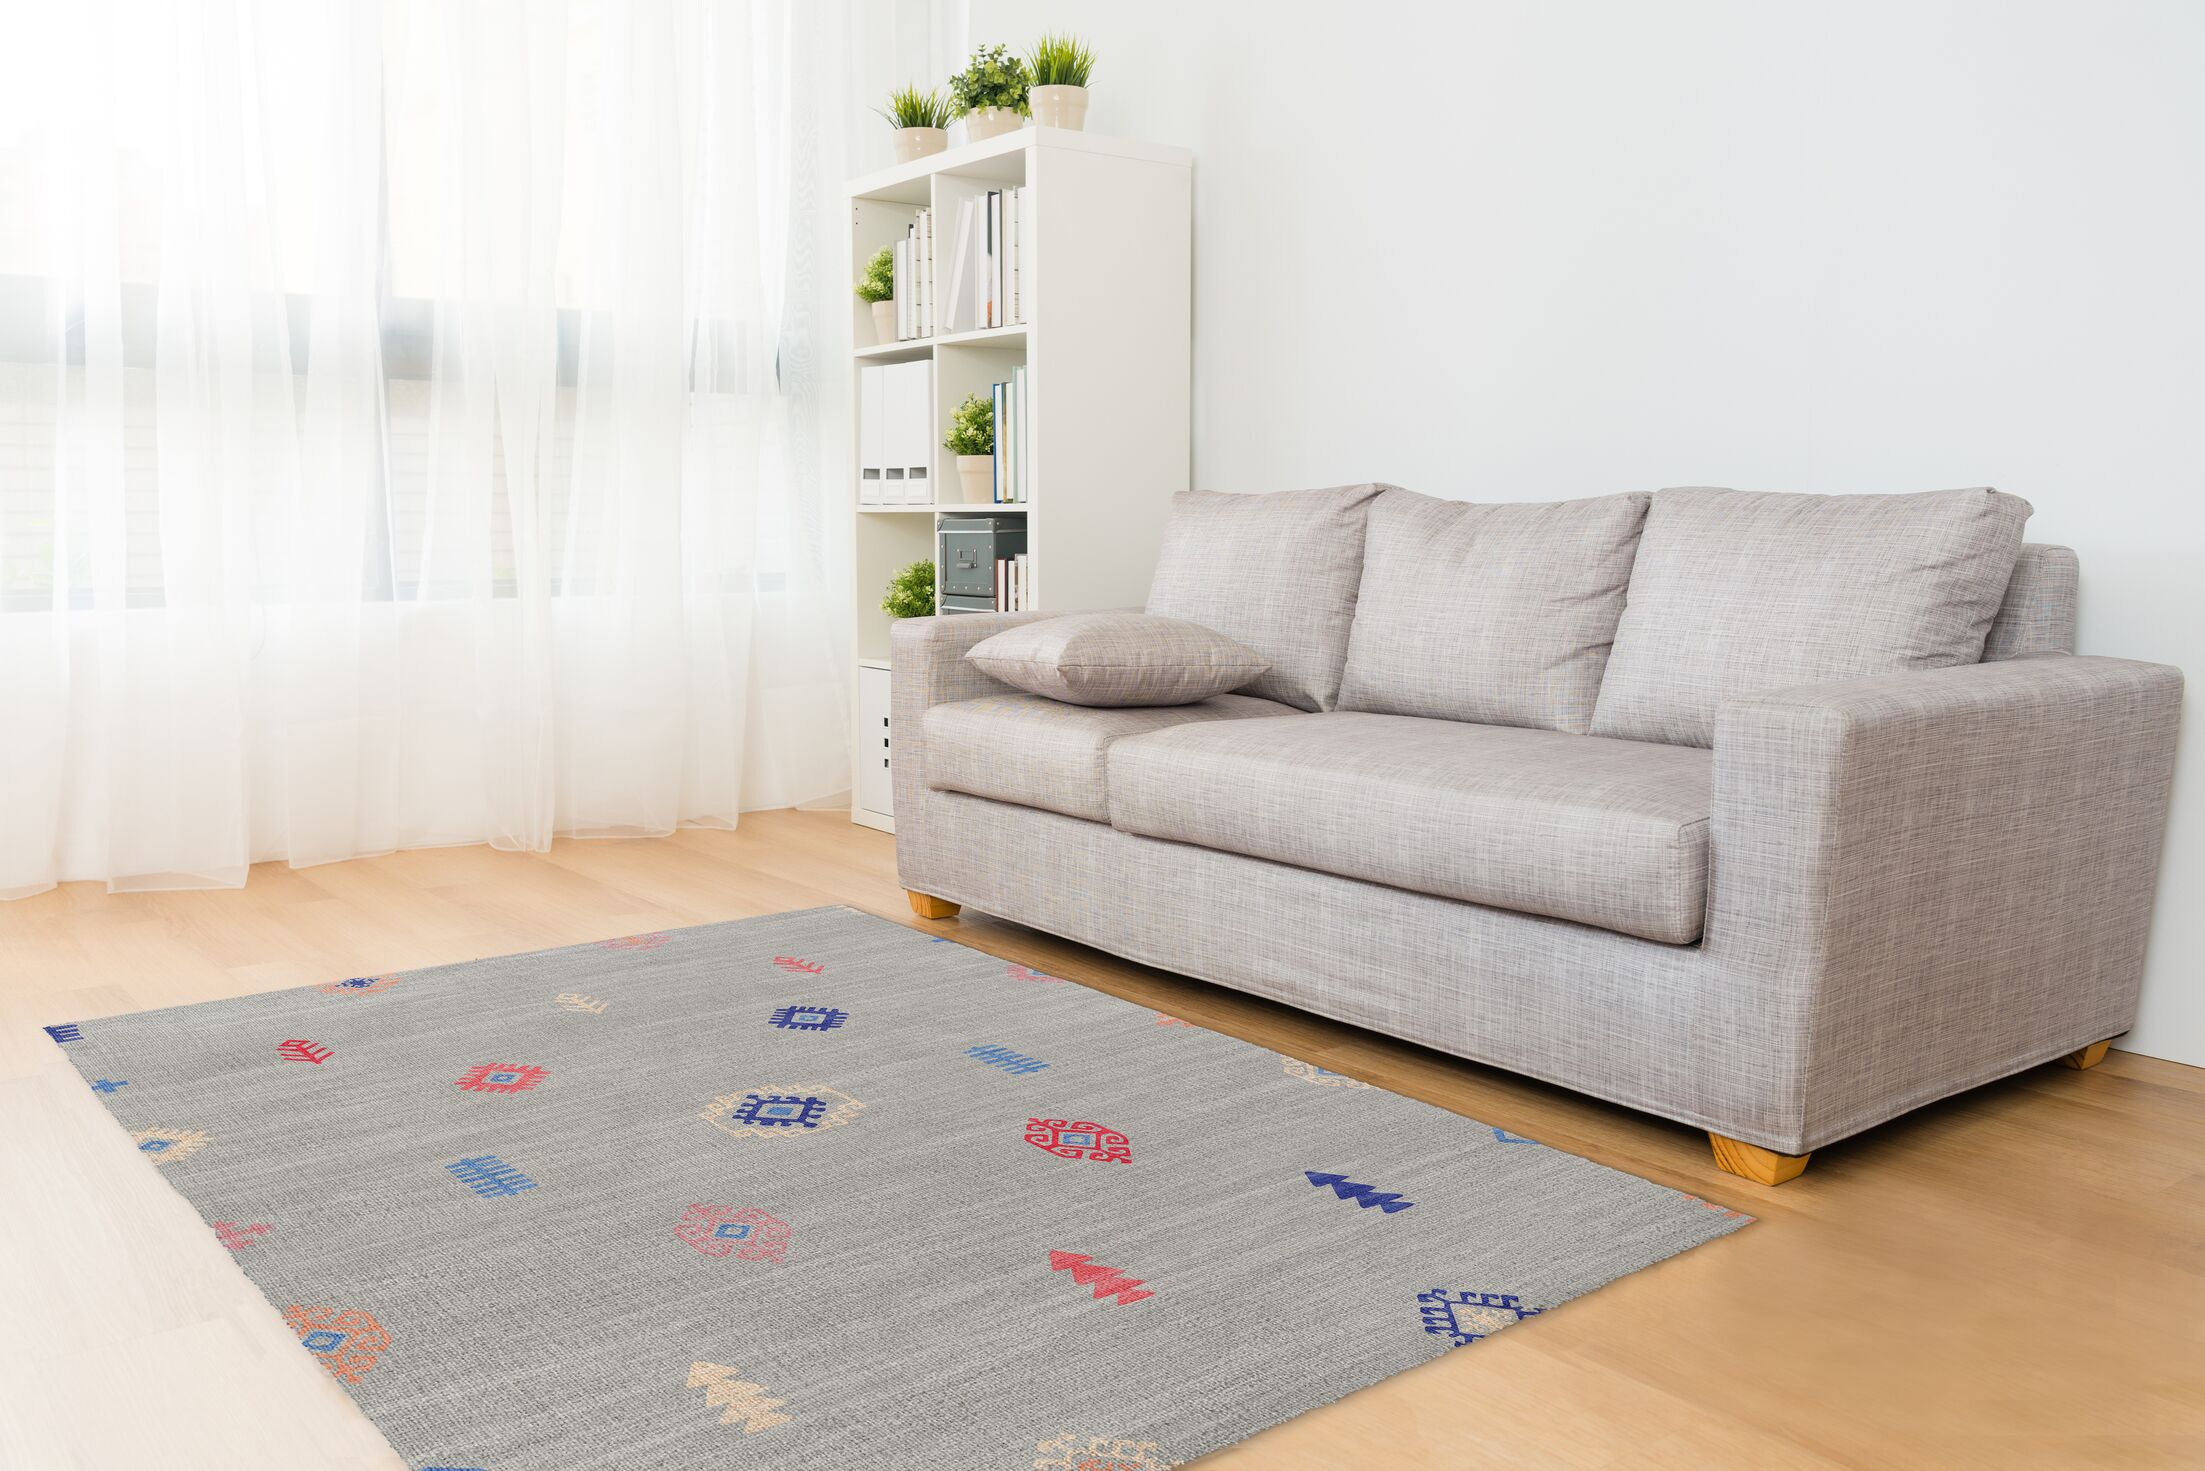 Mahaut Gray Area Rug Rug Size: Rectangle 3' x 5'